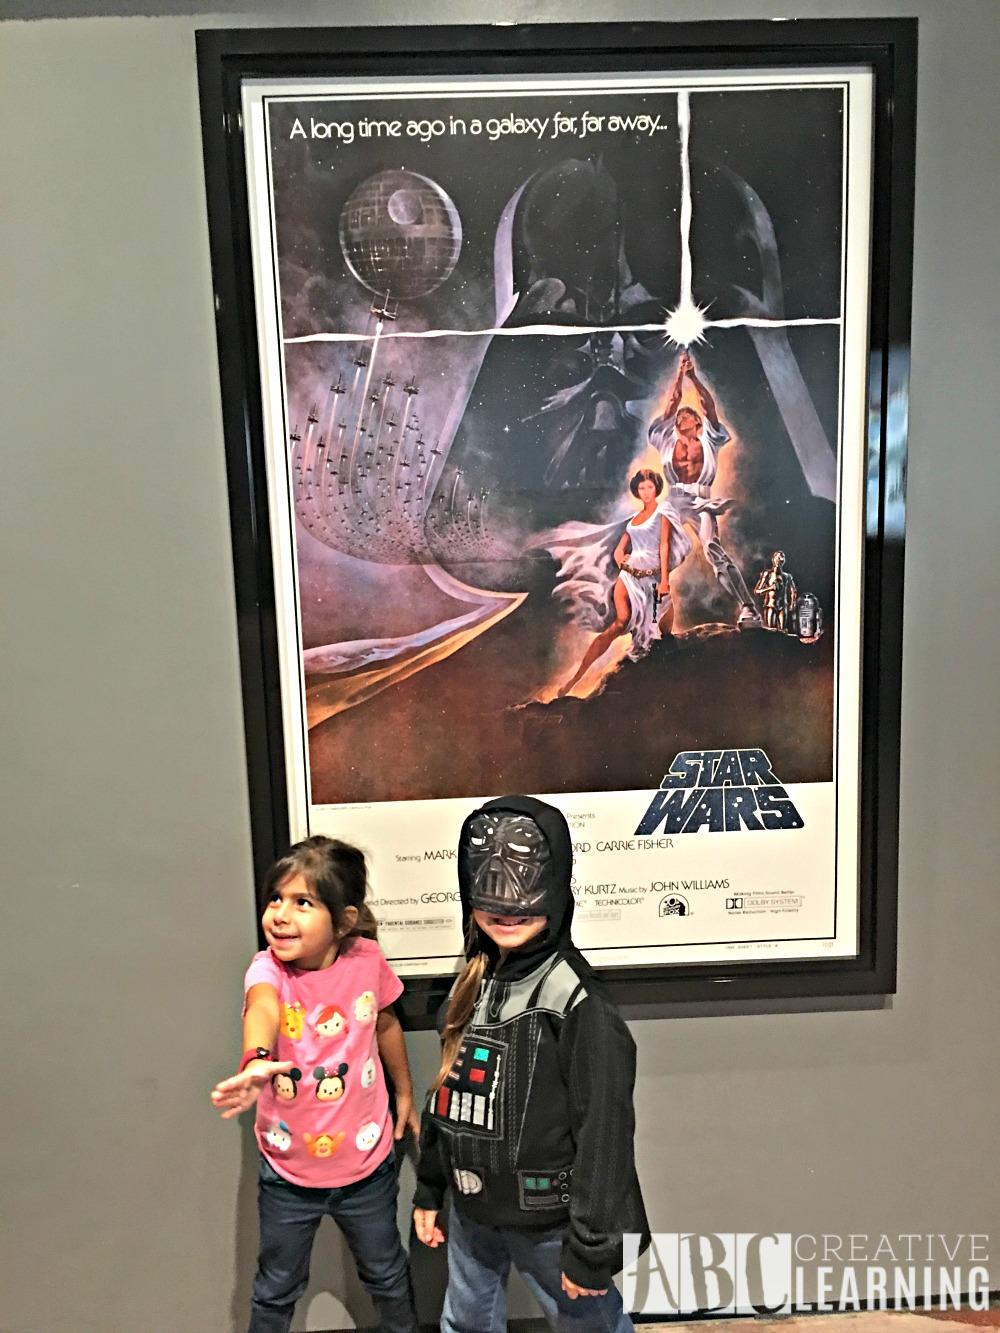 Star Wars Launch Bay at Hollywood Studios poster